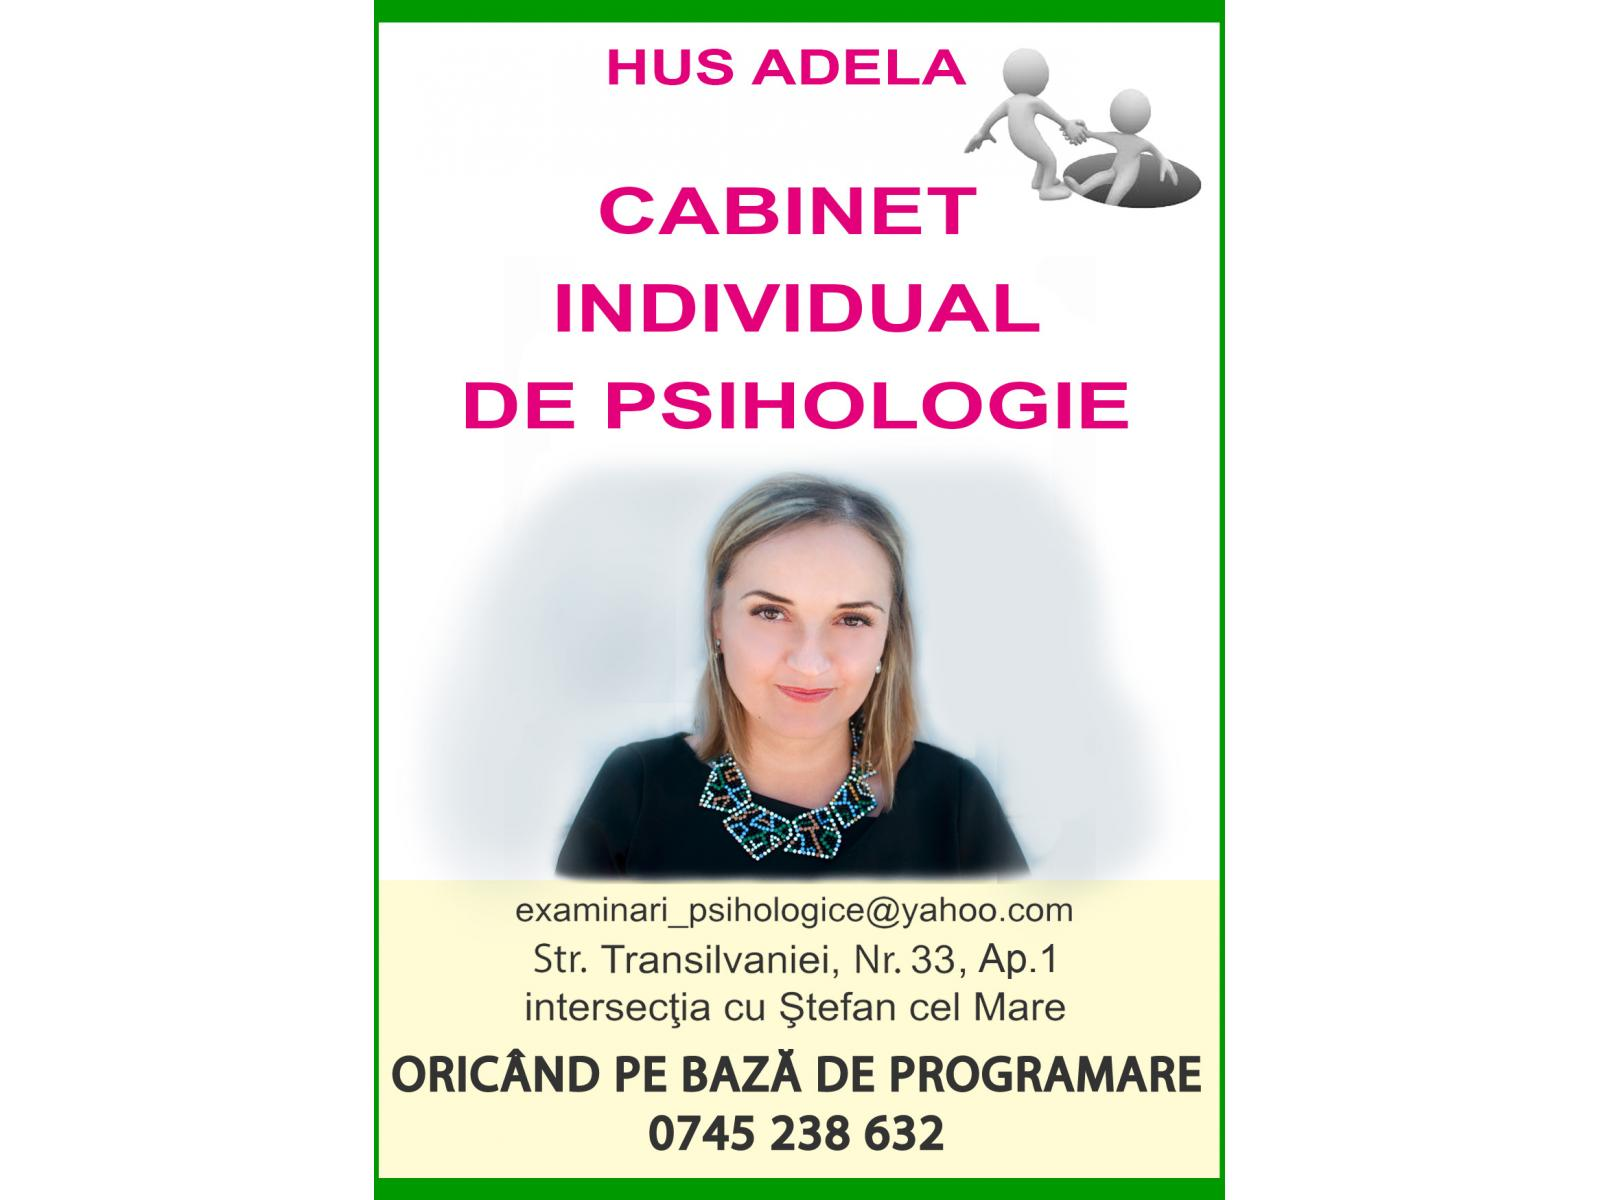 Hus Adela Cabinet Individual de Psihologie - adela_pliant.jpg